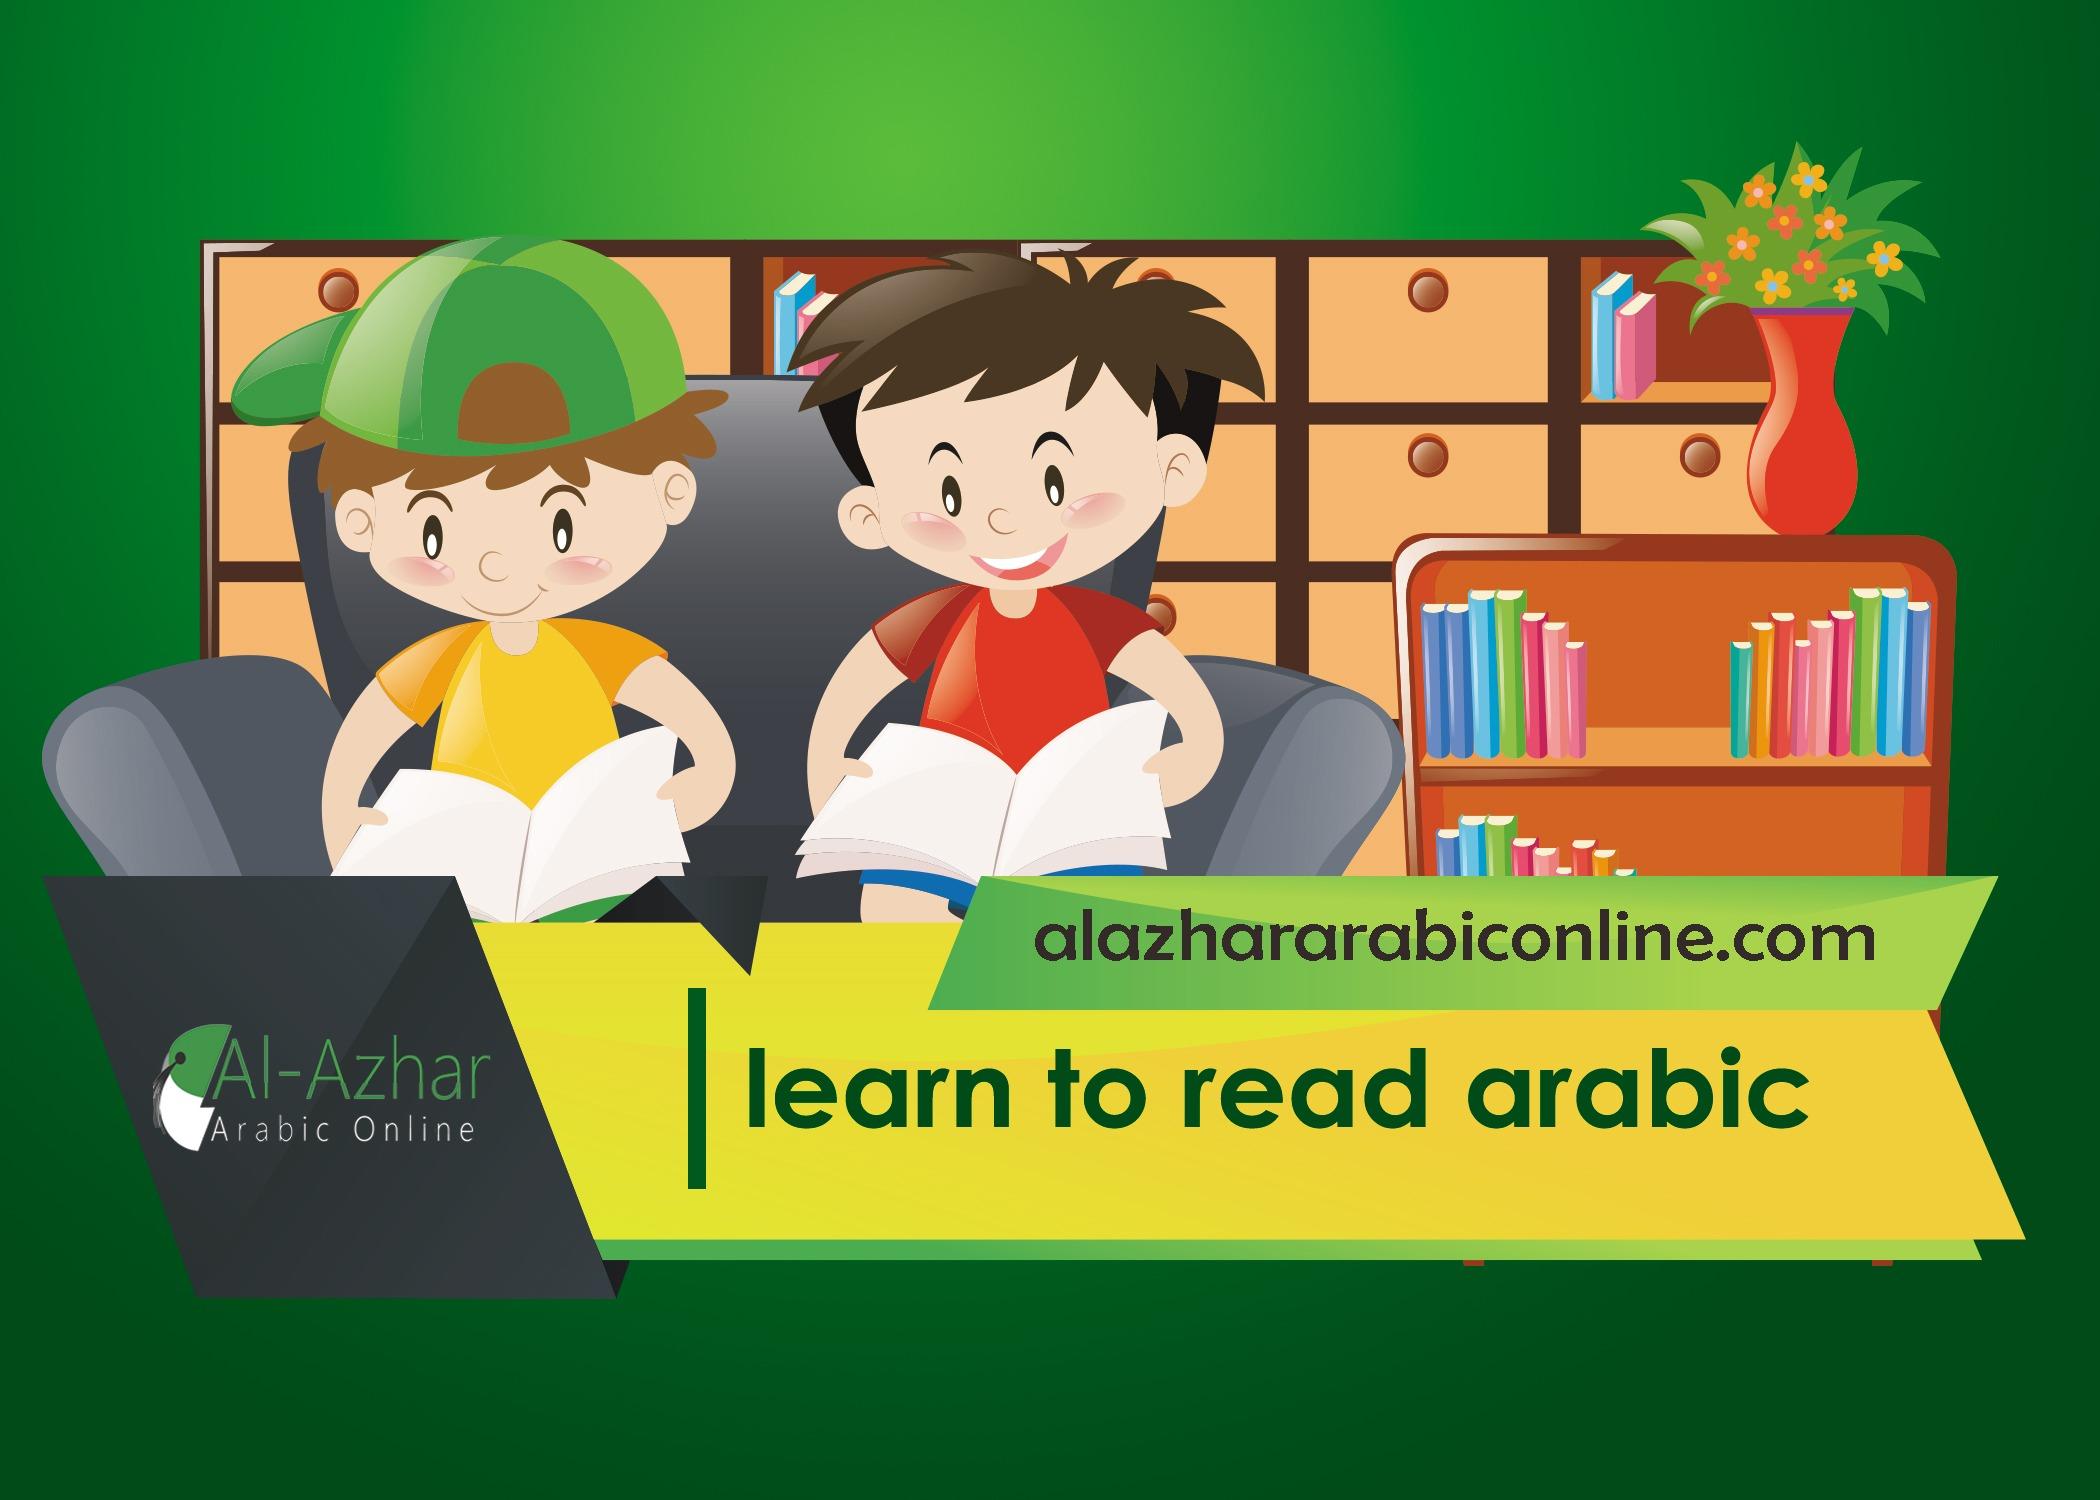 Learn to read Arabic, learning online, reading arabc